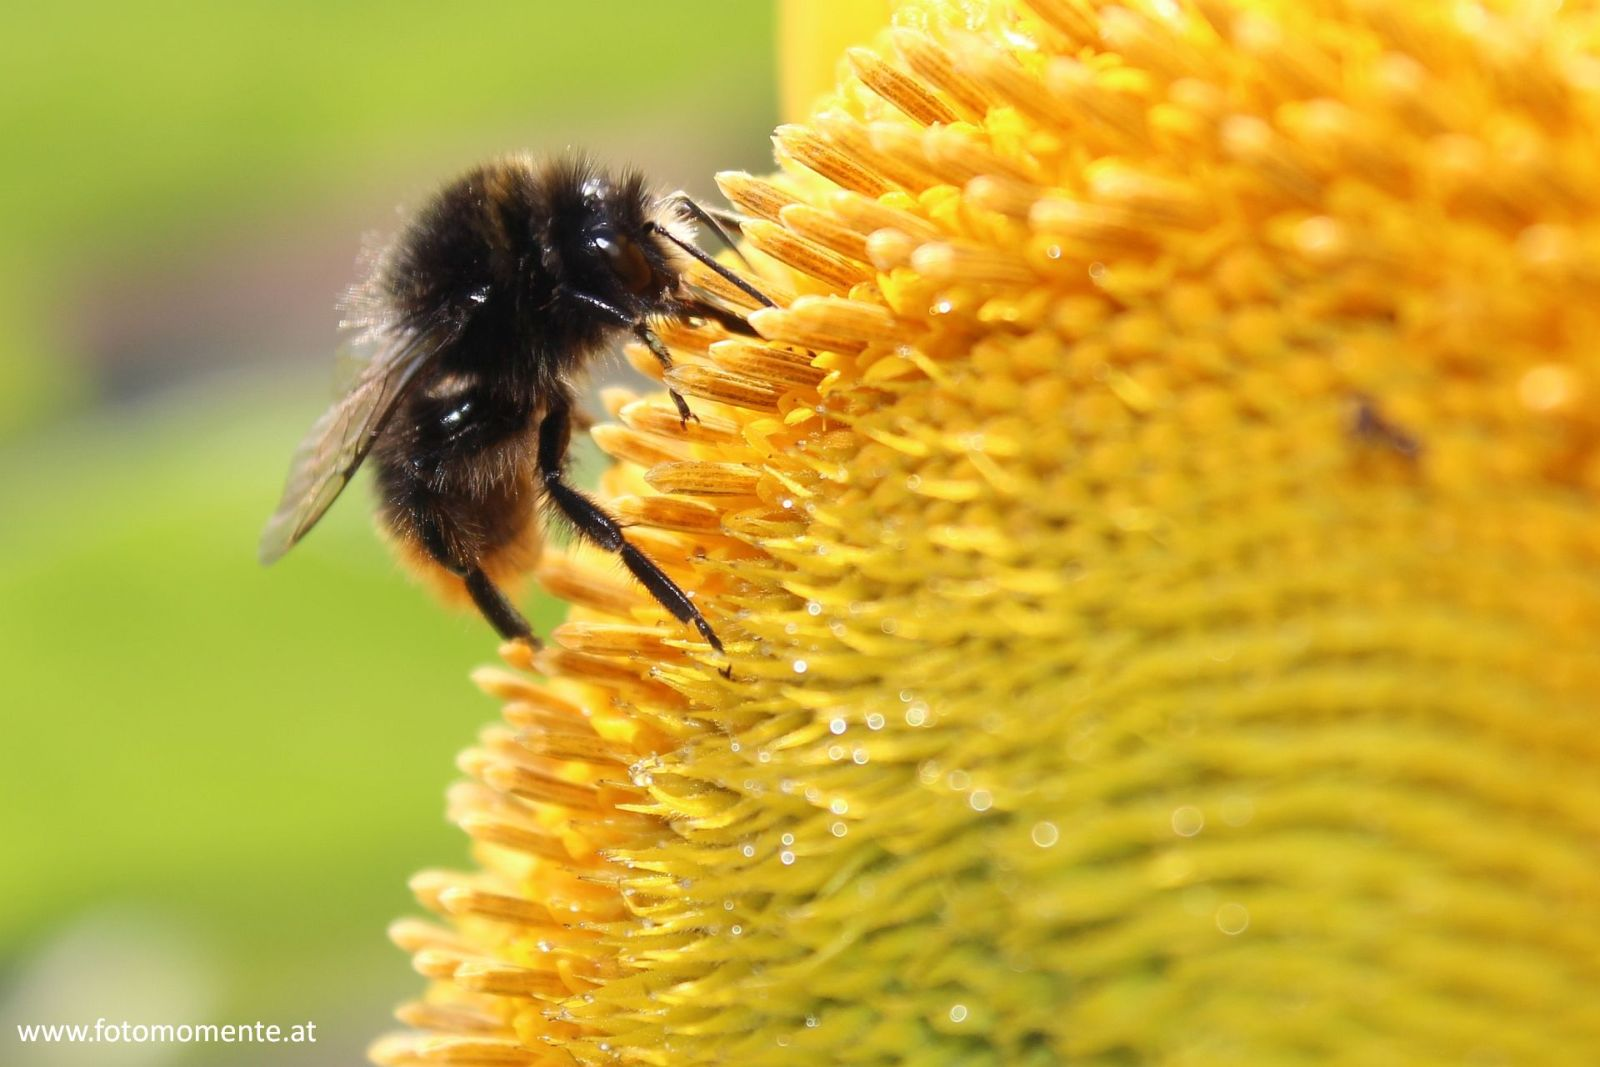 Erdhummel auf Sonnenblume - Erdhummel auf Sonnenblume